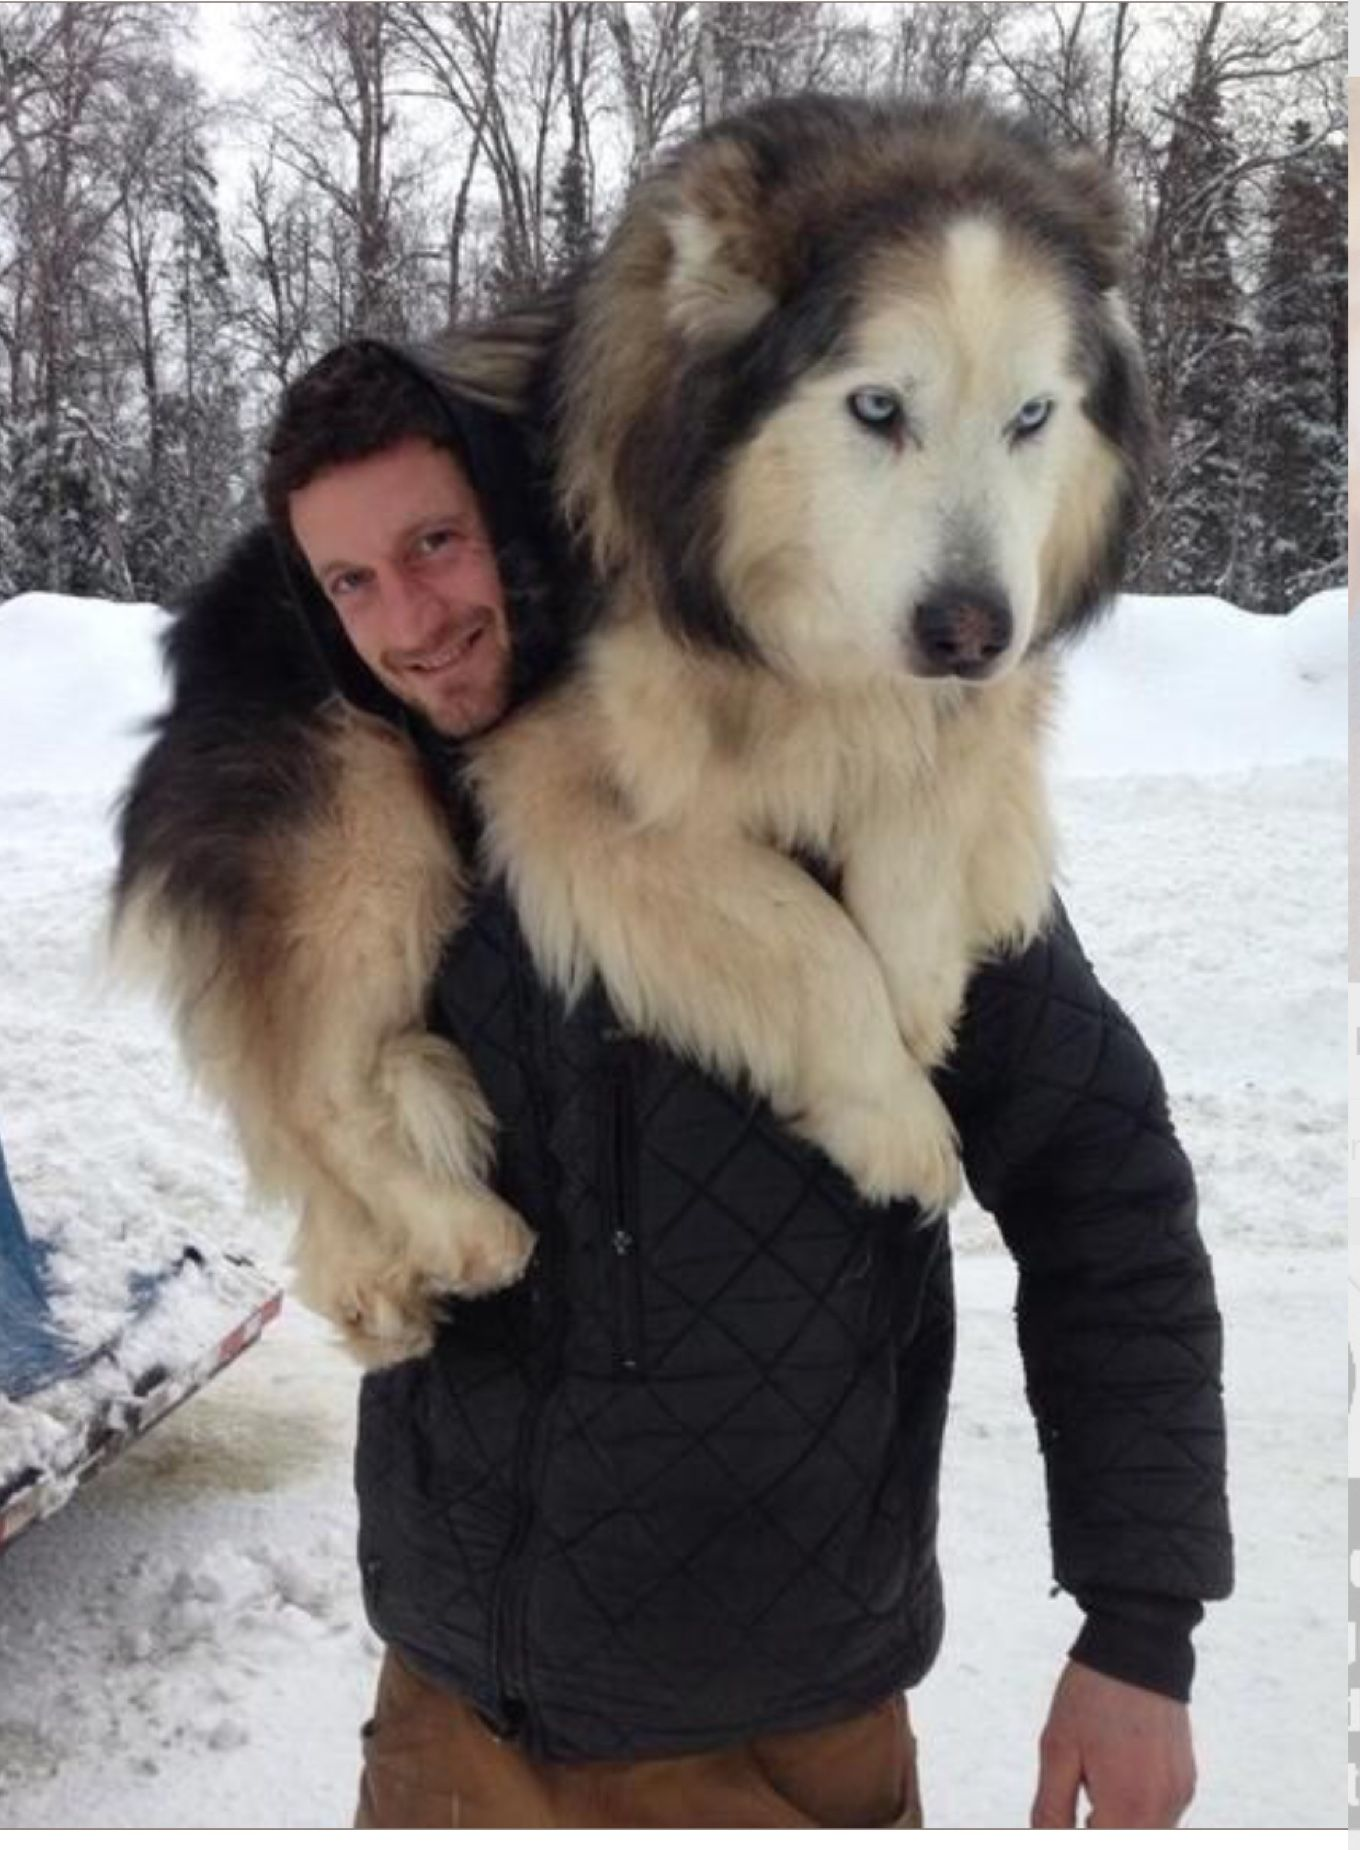 Pin by Alyssa Lautner on Screenshots Fluffy dogs, Dogs